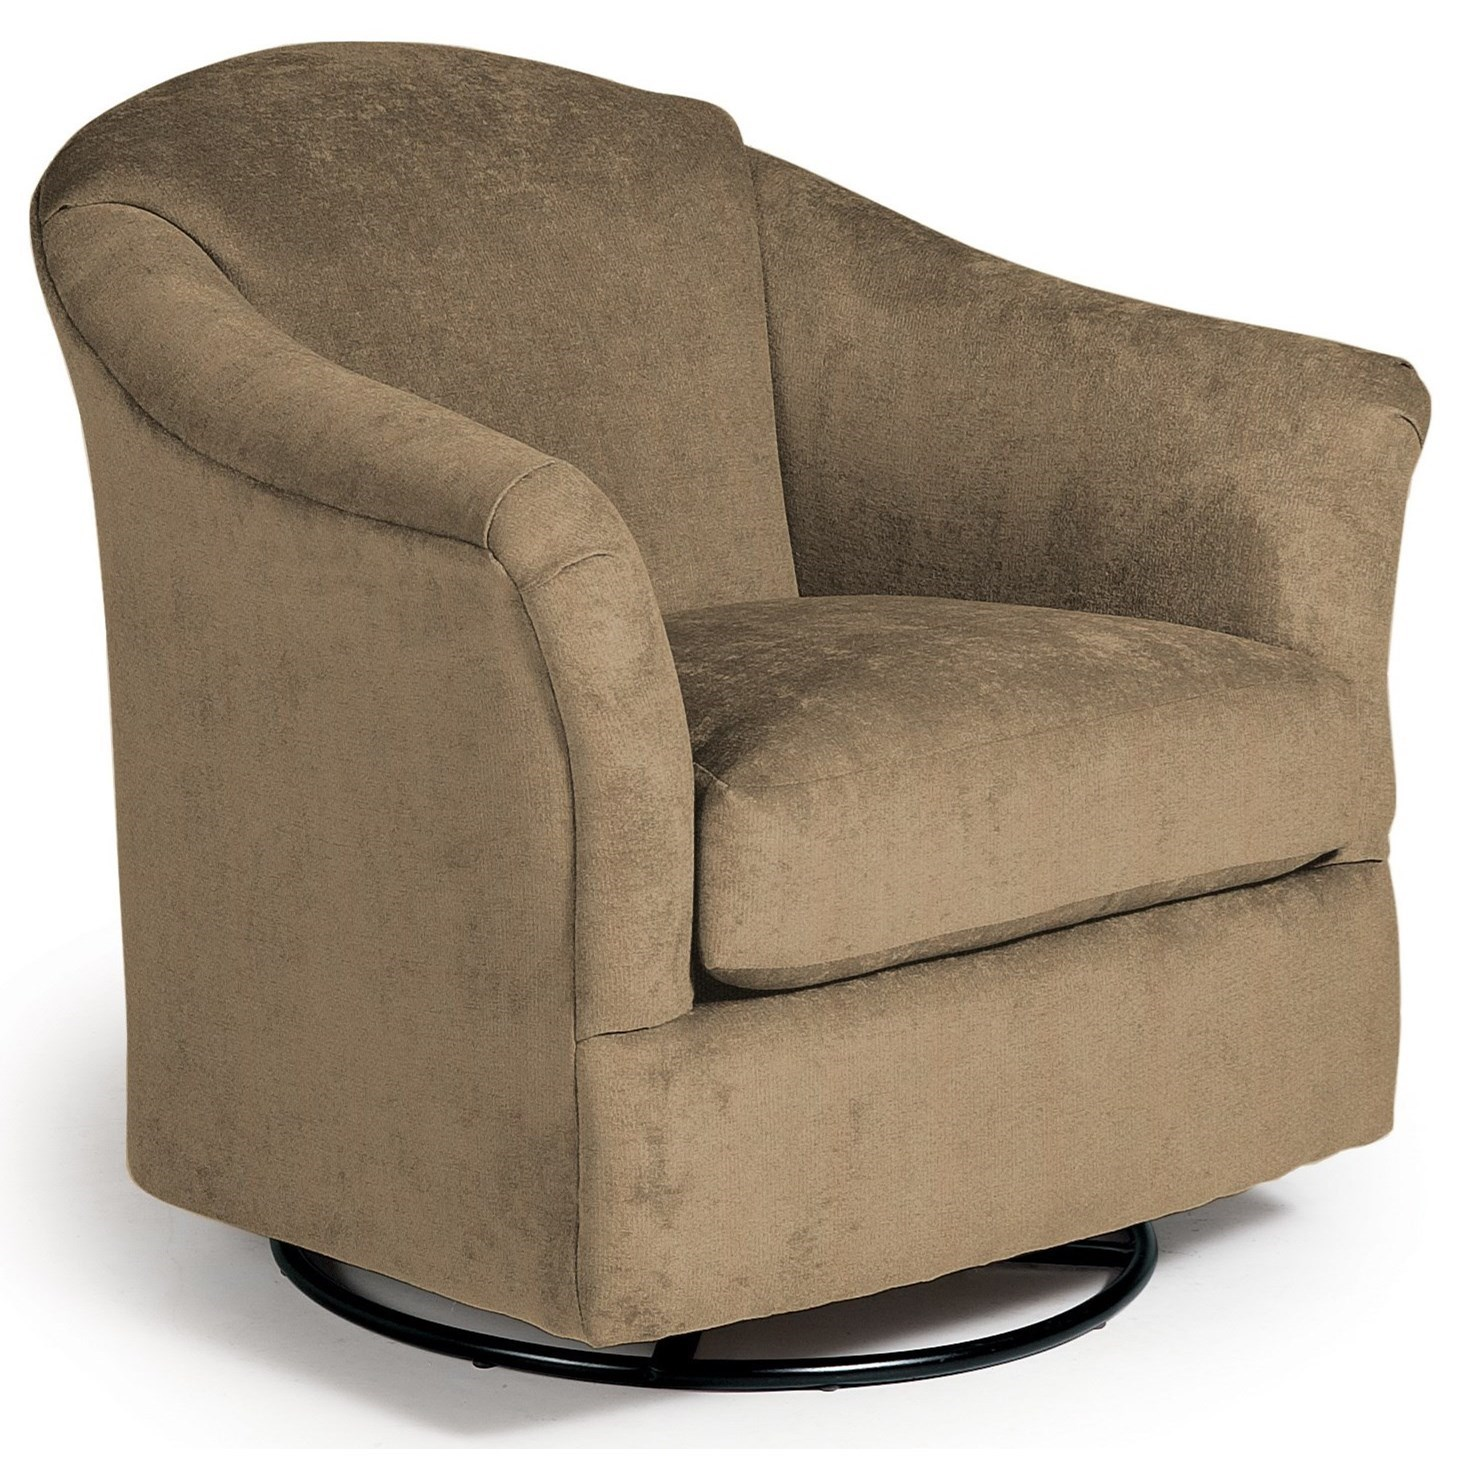 Best Home Furnishings Swivel Glide Chairs Darby Swivel